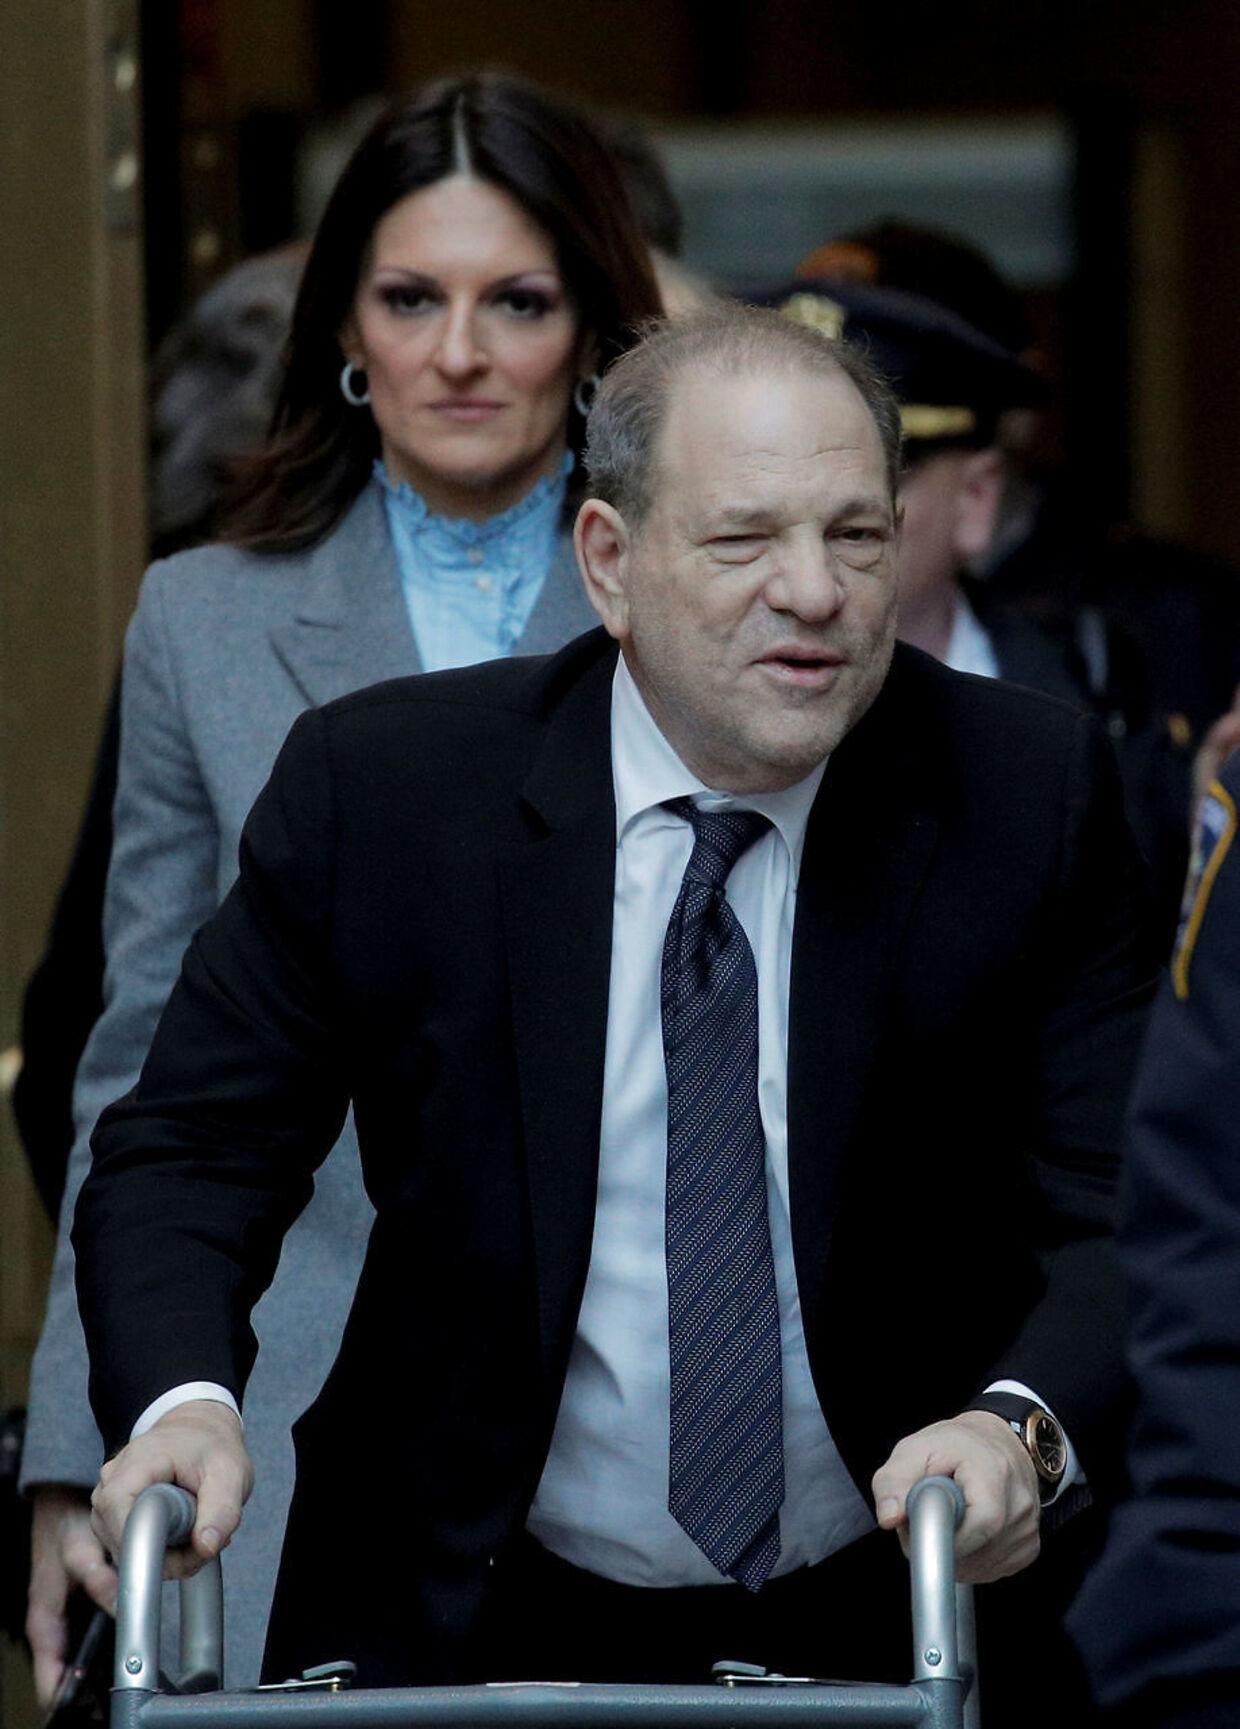 Harvey Weinstein med gangstativ. Bag Weinstein ses forsvarsadvokat Donna Rotunno.